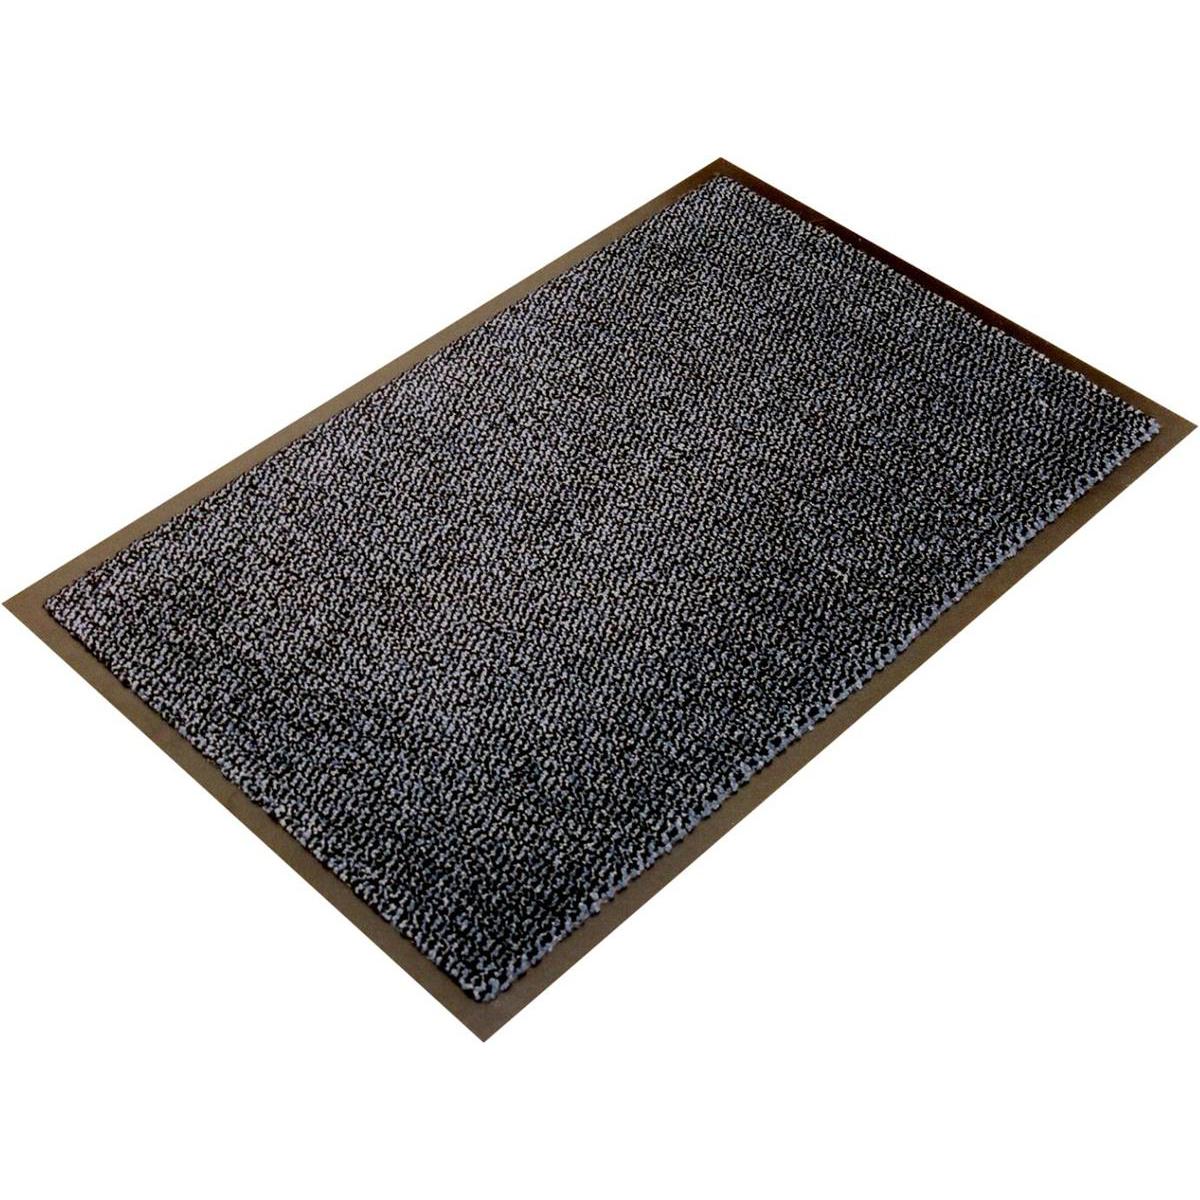 Doortex Ultimat Entrance Mat Indoor Use Nylon Monofilaments 900x3000mm Grey Ref FC490300ULTGR